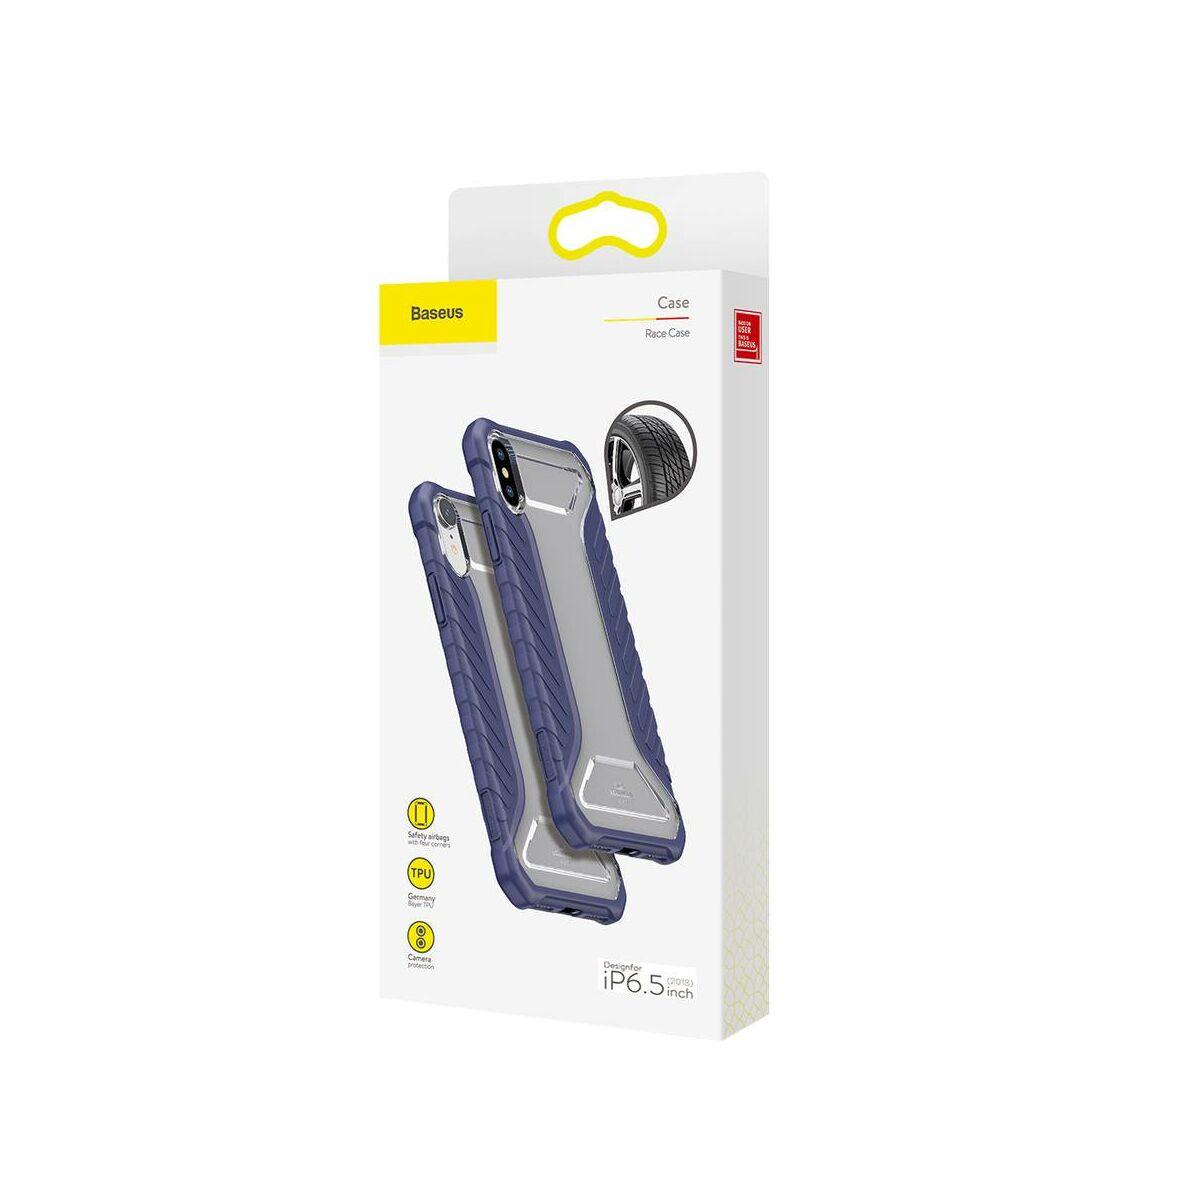 Baseus iPhone XS Max tok, Michelin, kék (WIAPIPH65-MK03)